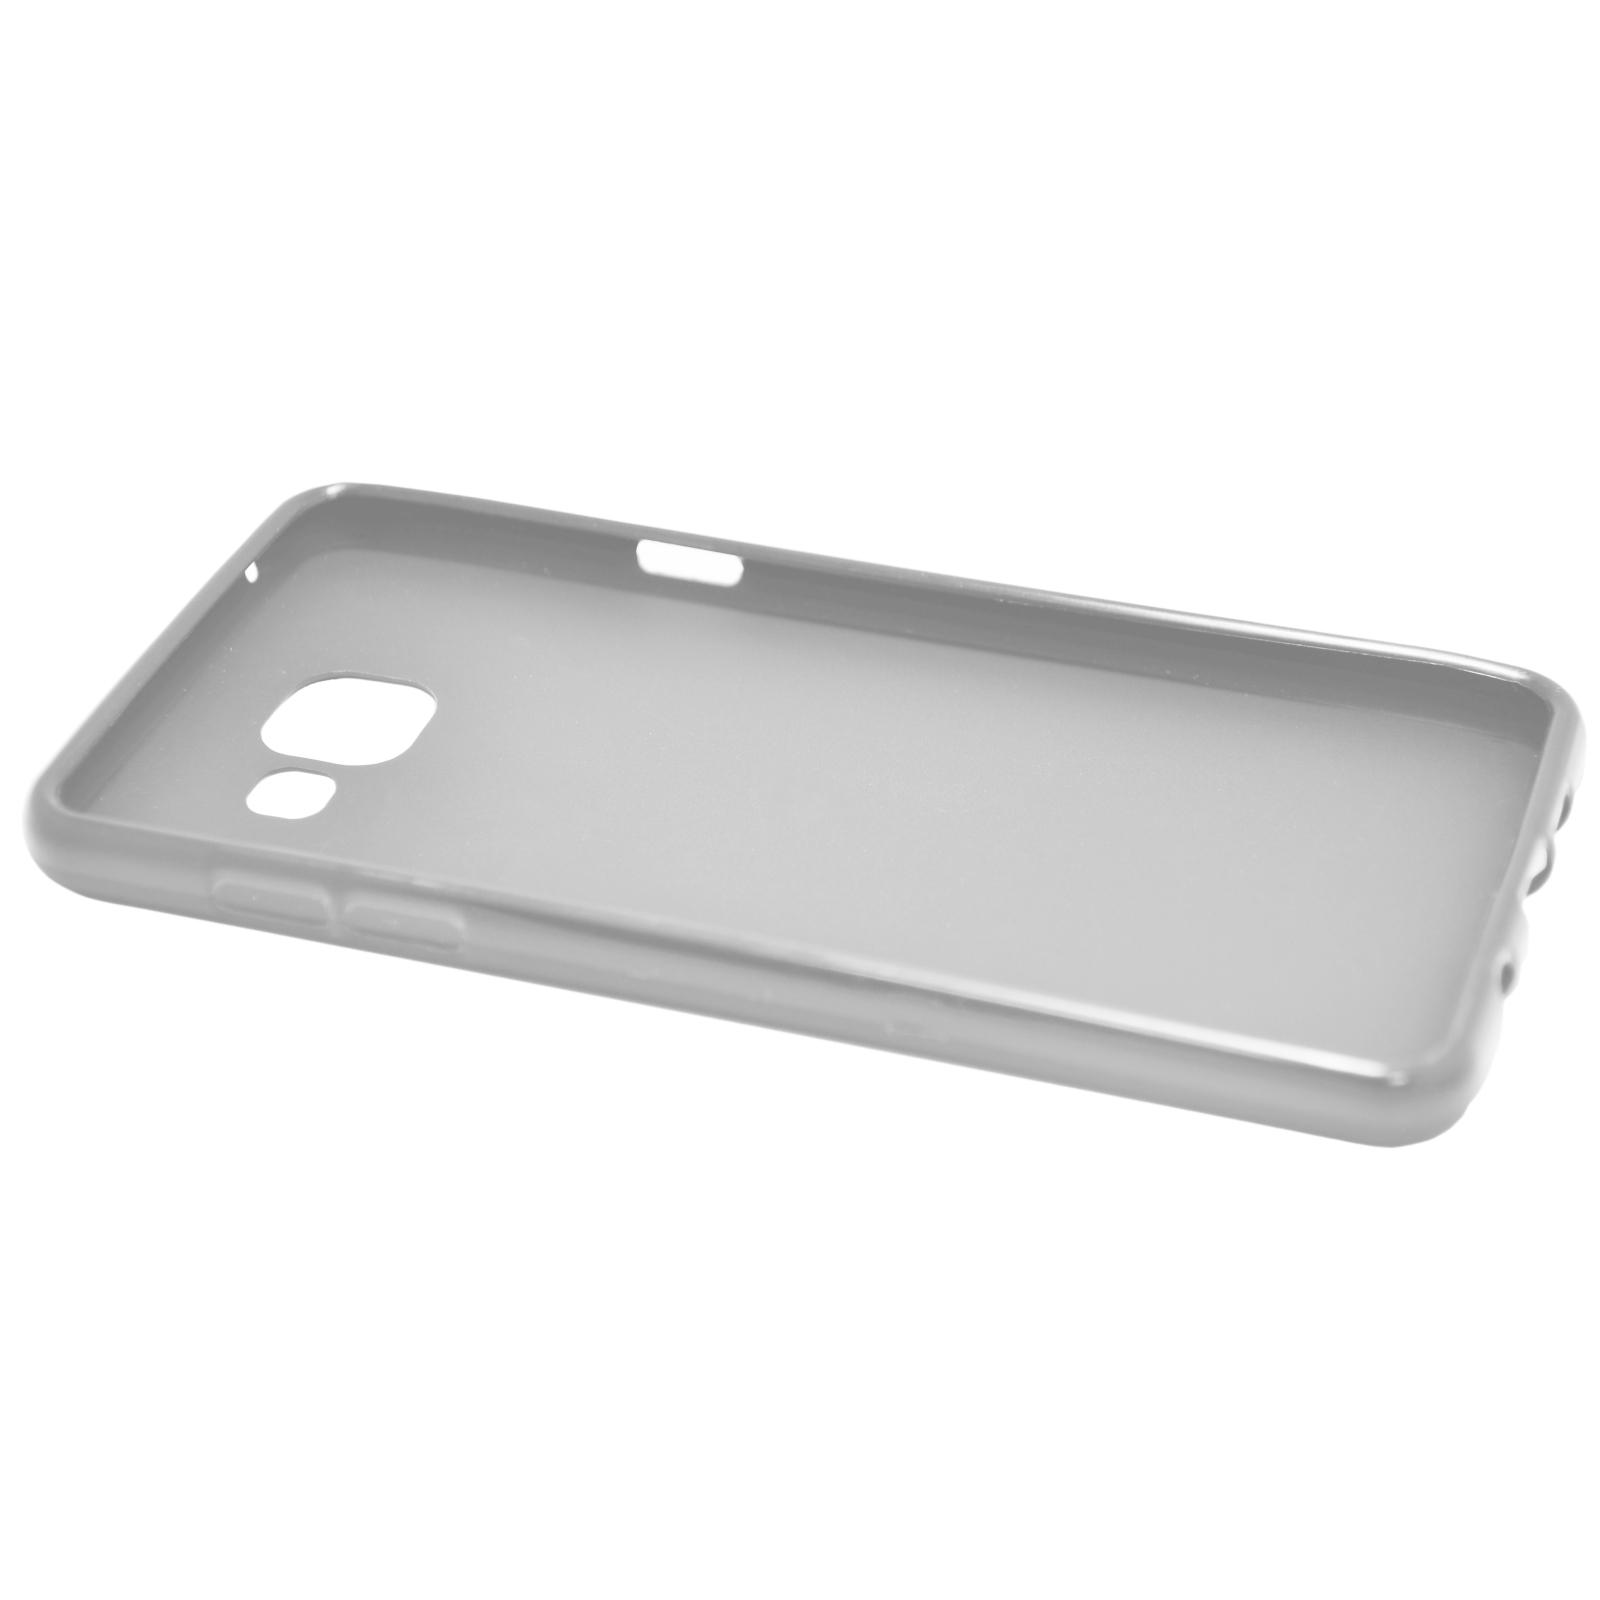 Чехол для моб. телефона Pro-case для Samsung Galaxy A5 (A510) White (CP-306-WHT) (CP-306-WHT) изображение 2